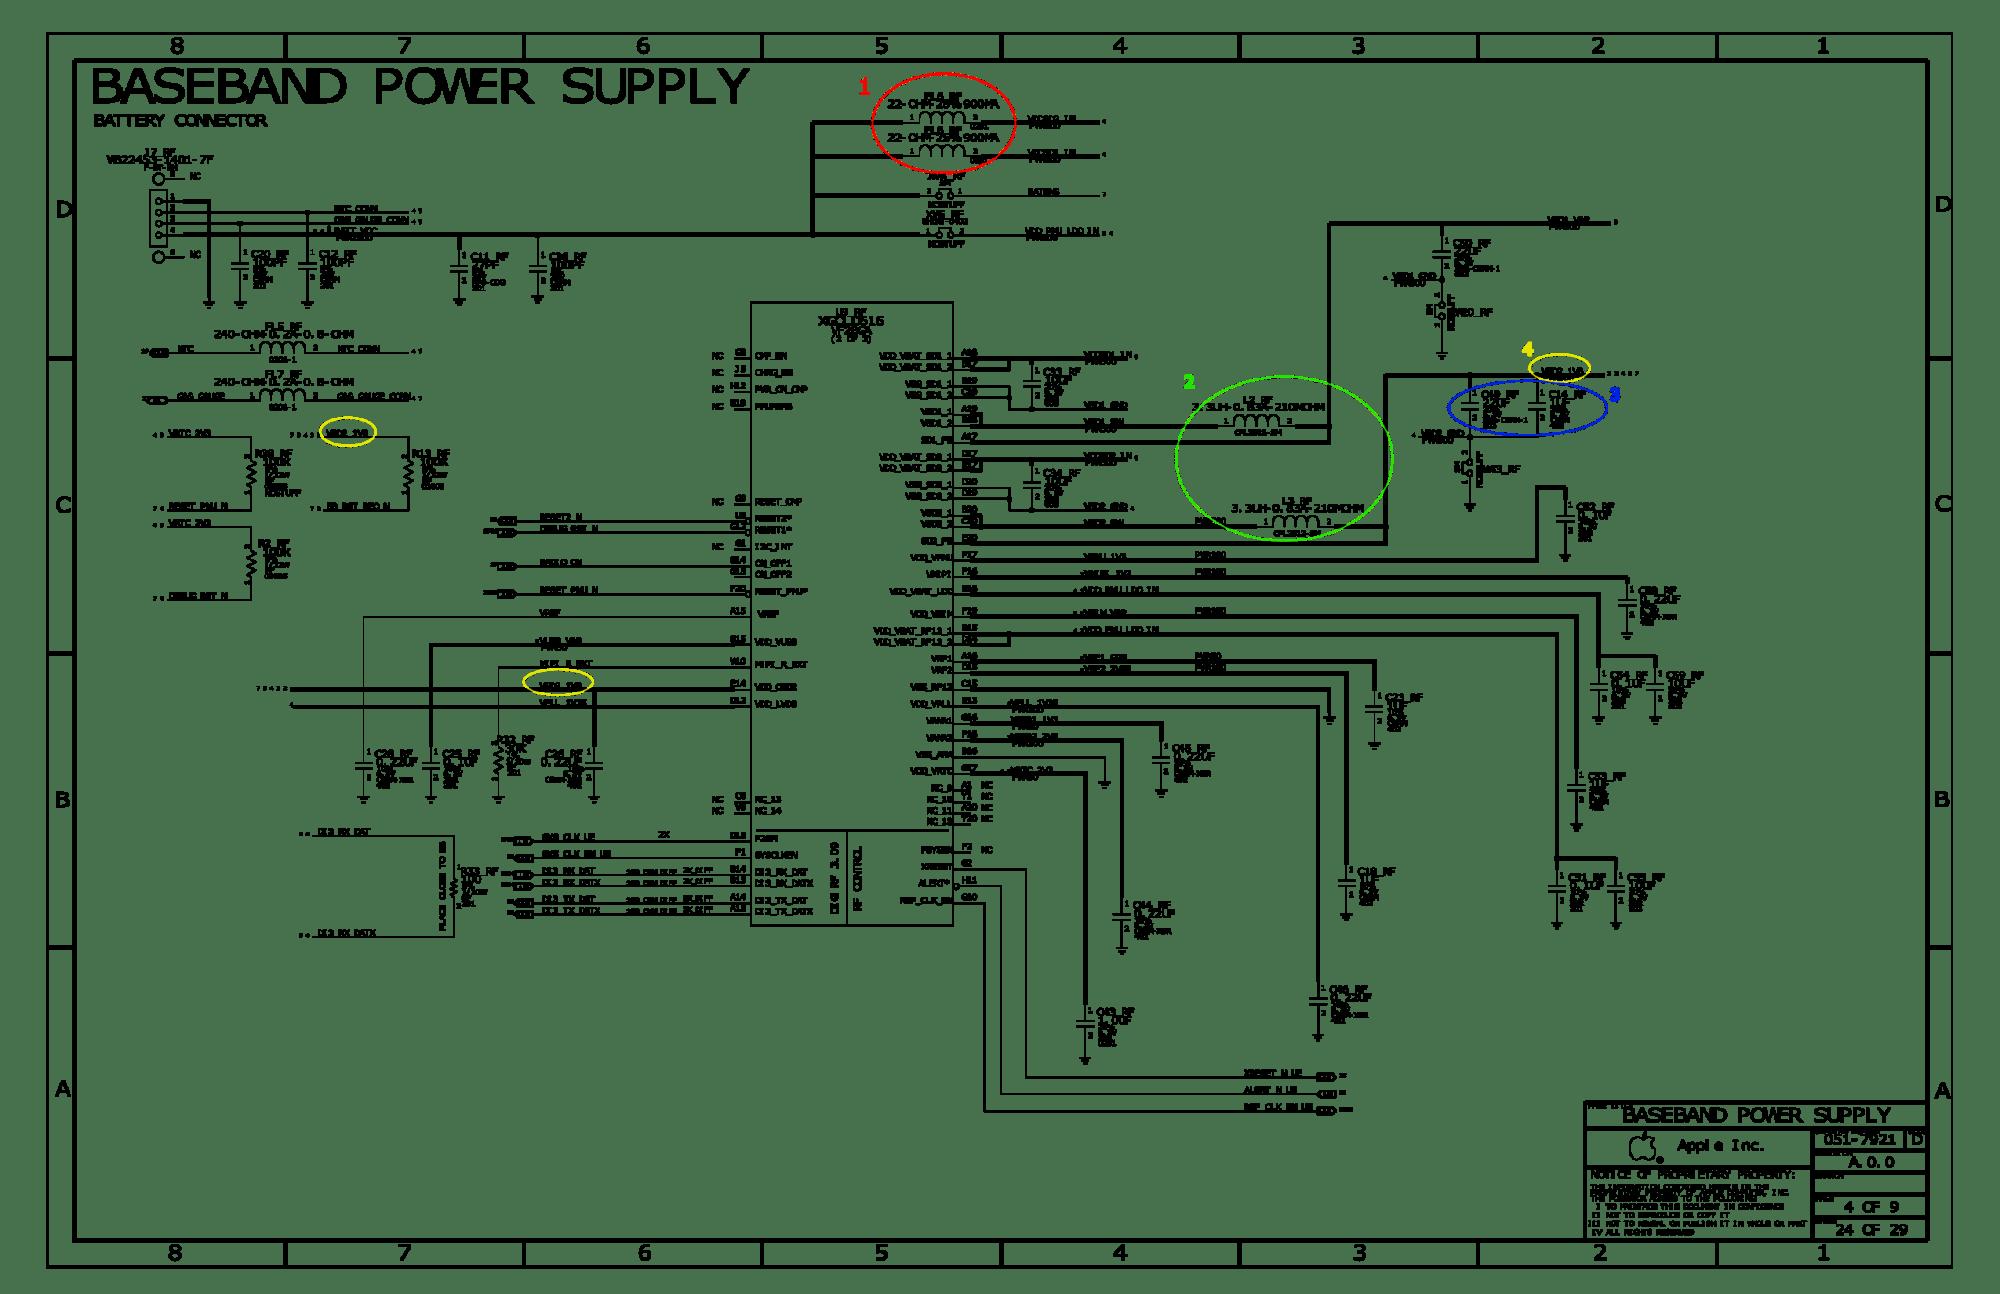 hight resolution of wow engineering schematics wiring diagram today wow rare engineering schematics pet engineering schematics wow wiring diagram